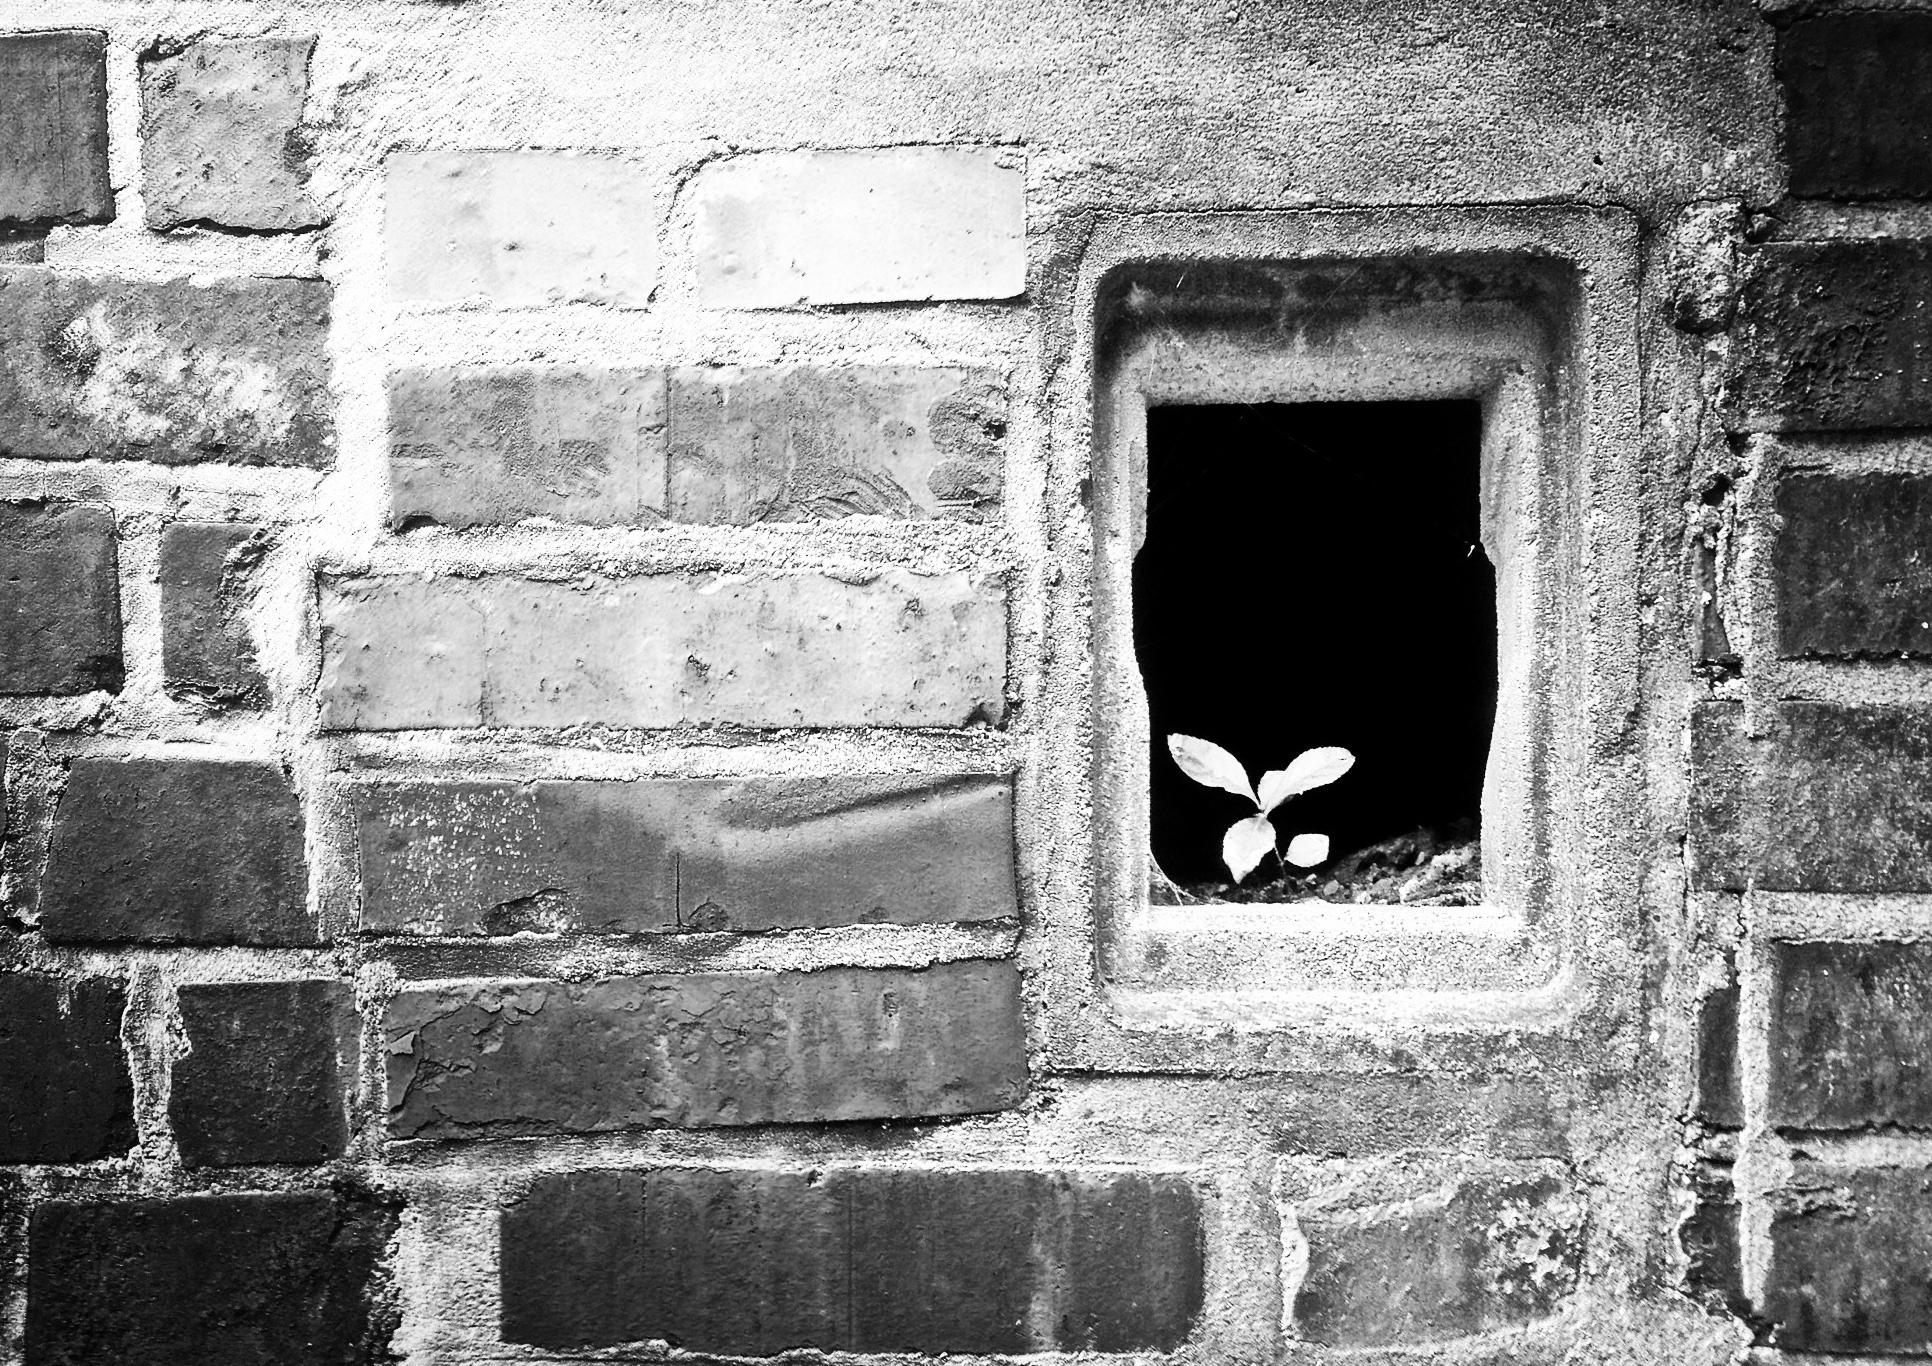 Hans Borghorst ~ There's still hope